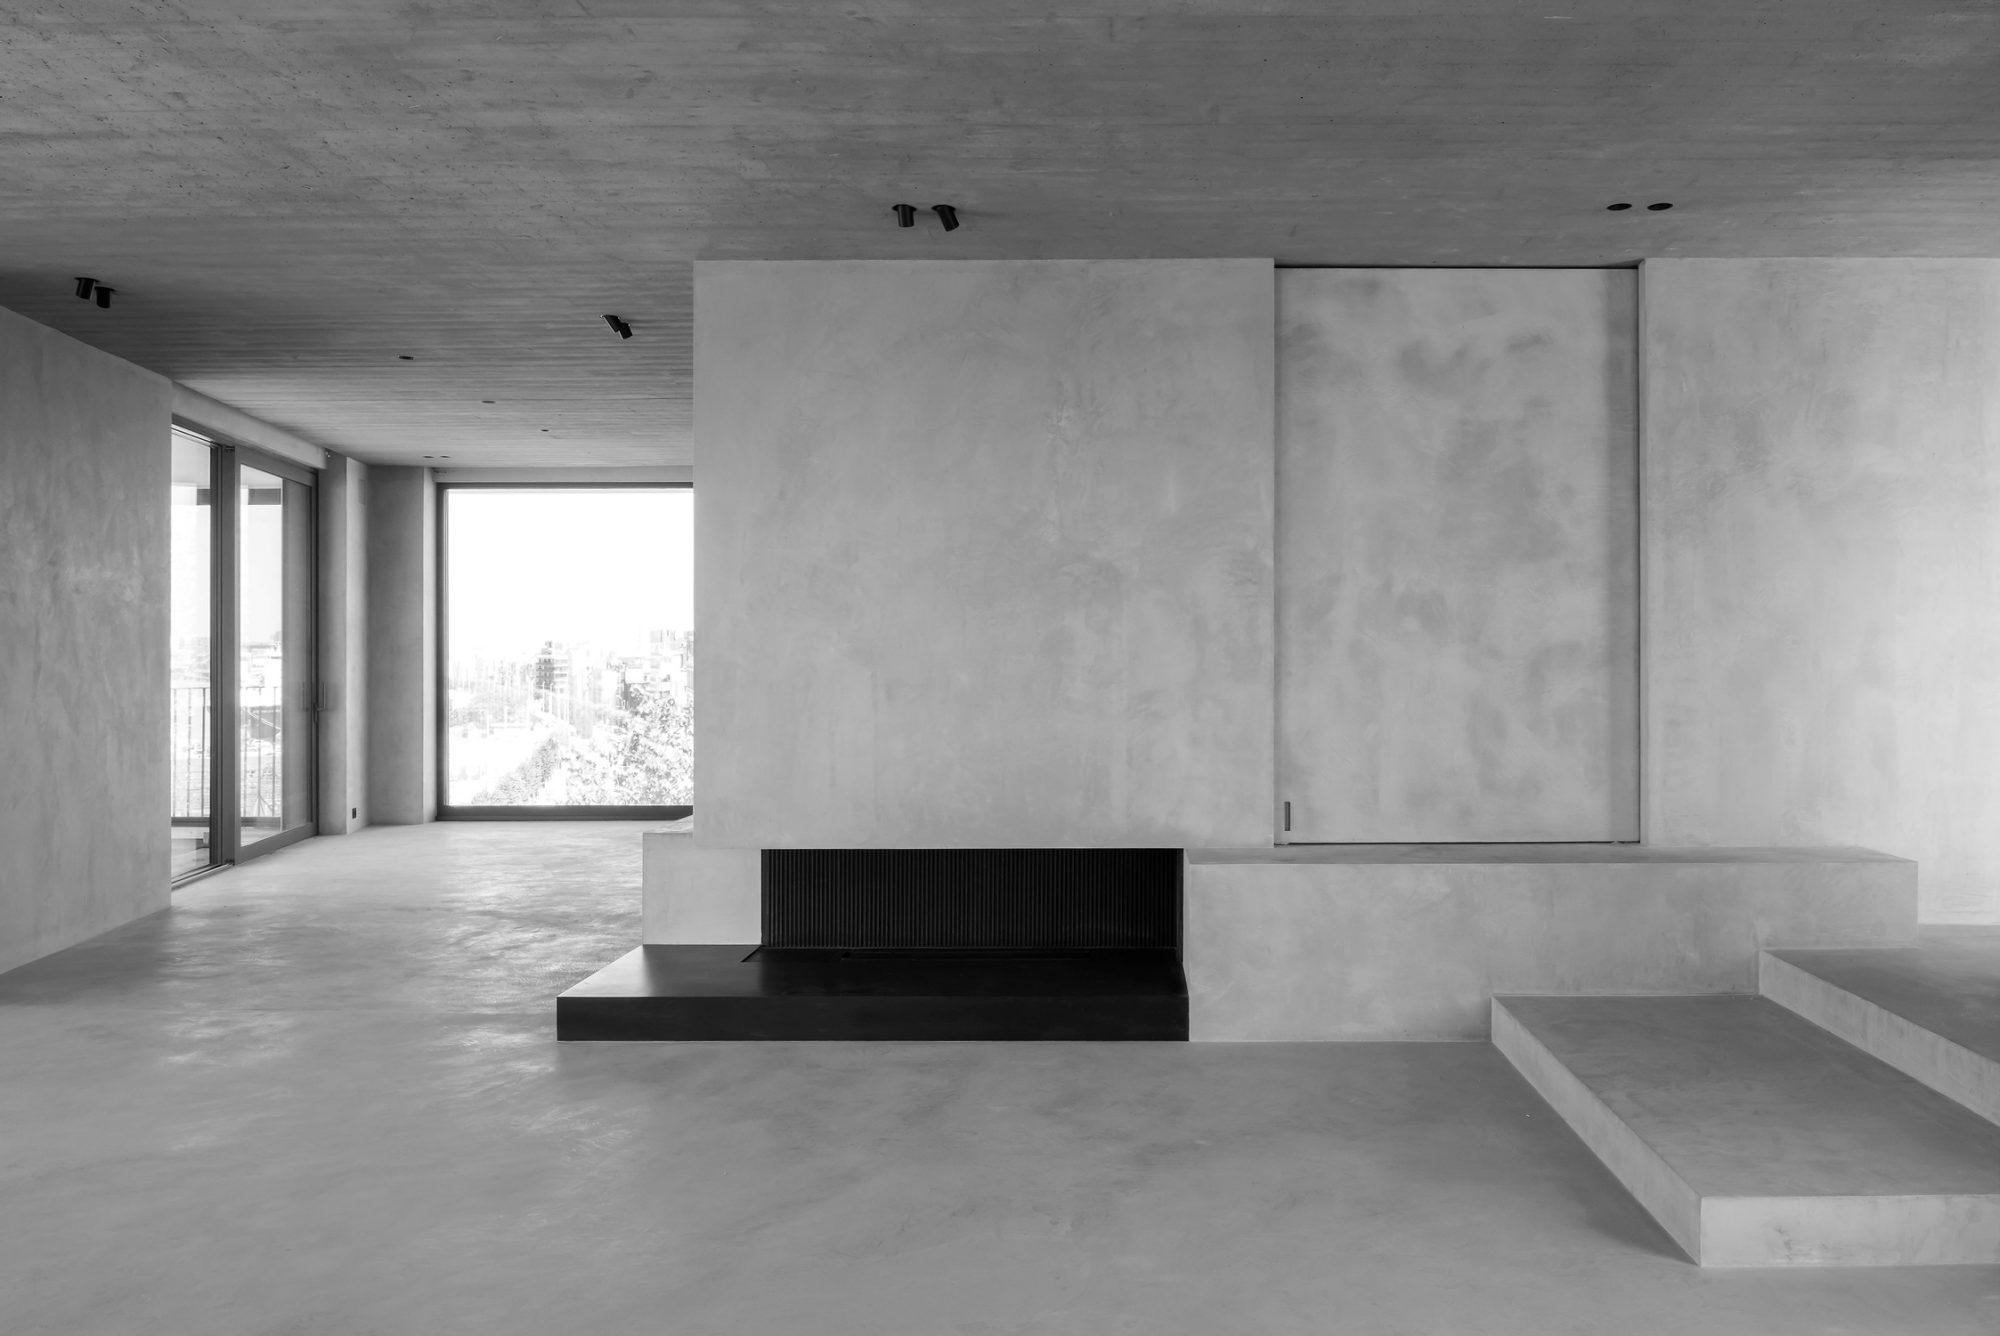 Architect Vincent Van Duysen de - barenbrug | ello